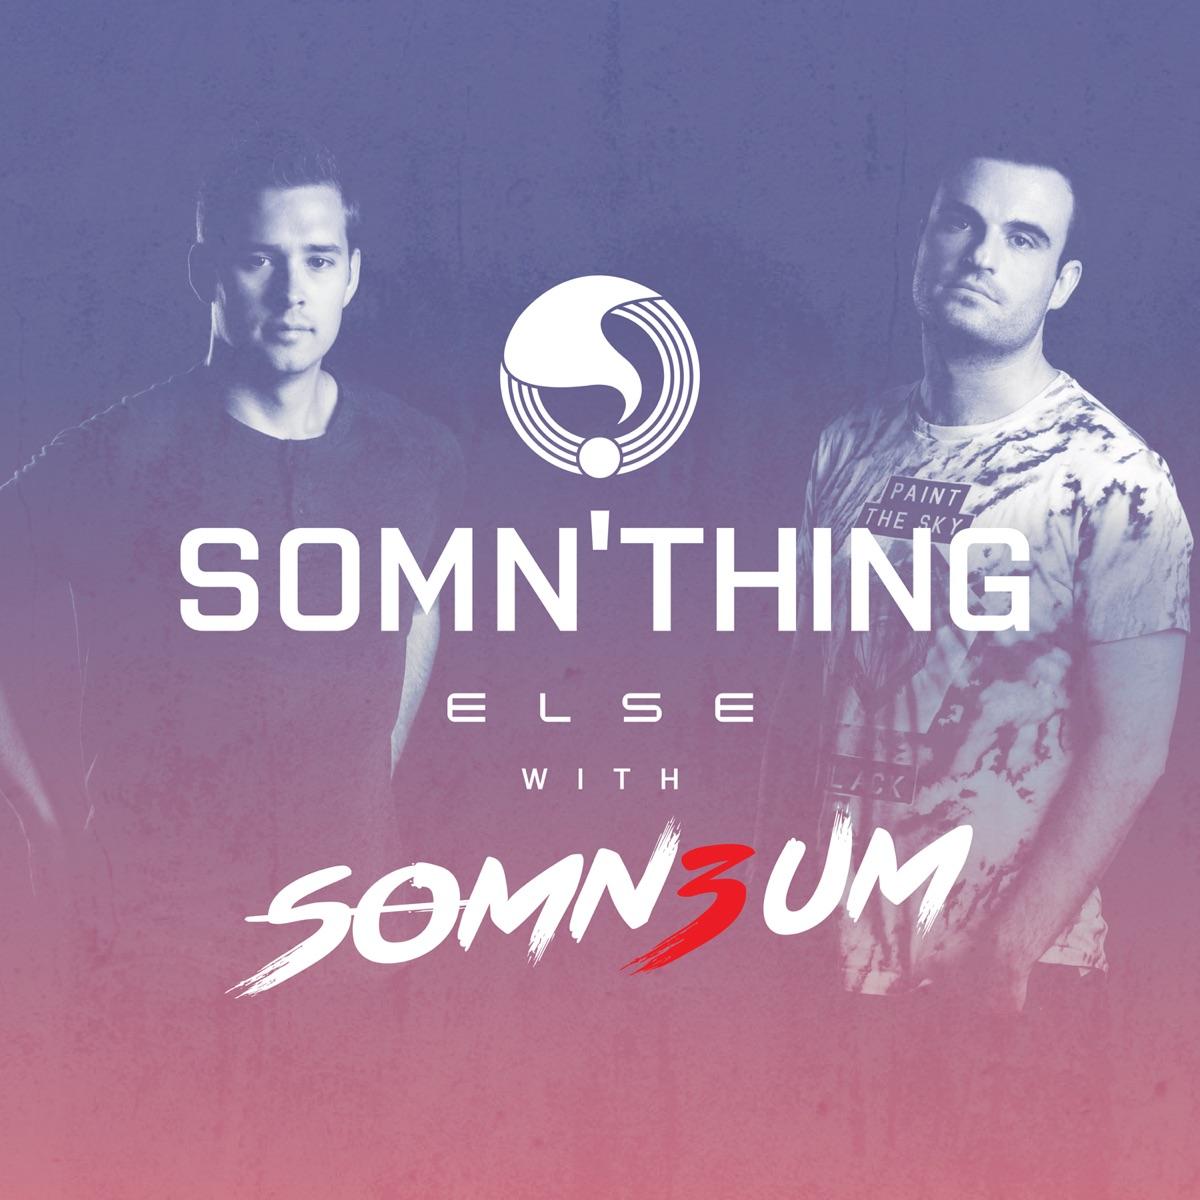 Somn'thing Else with Somn3um